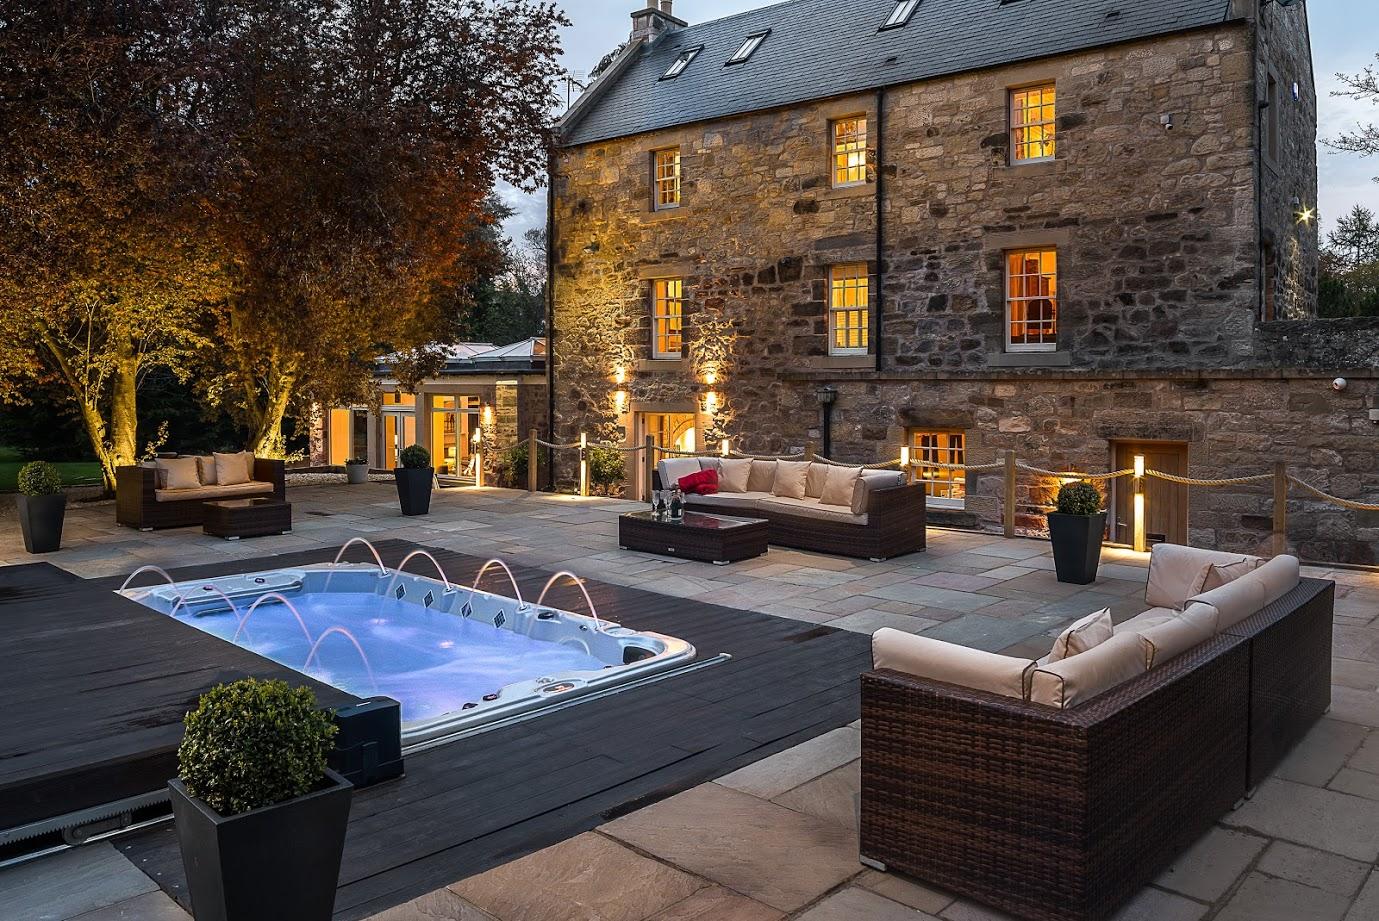 edinburgh scottish wedding venue exclusive use hot tub outdoor ceremony scotland